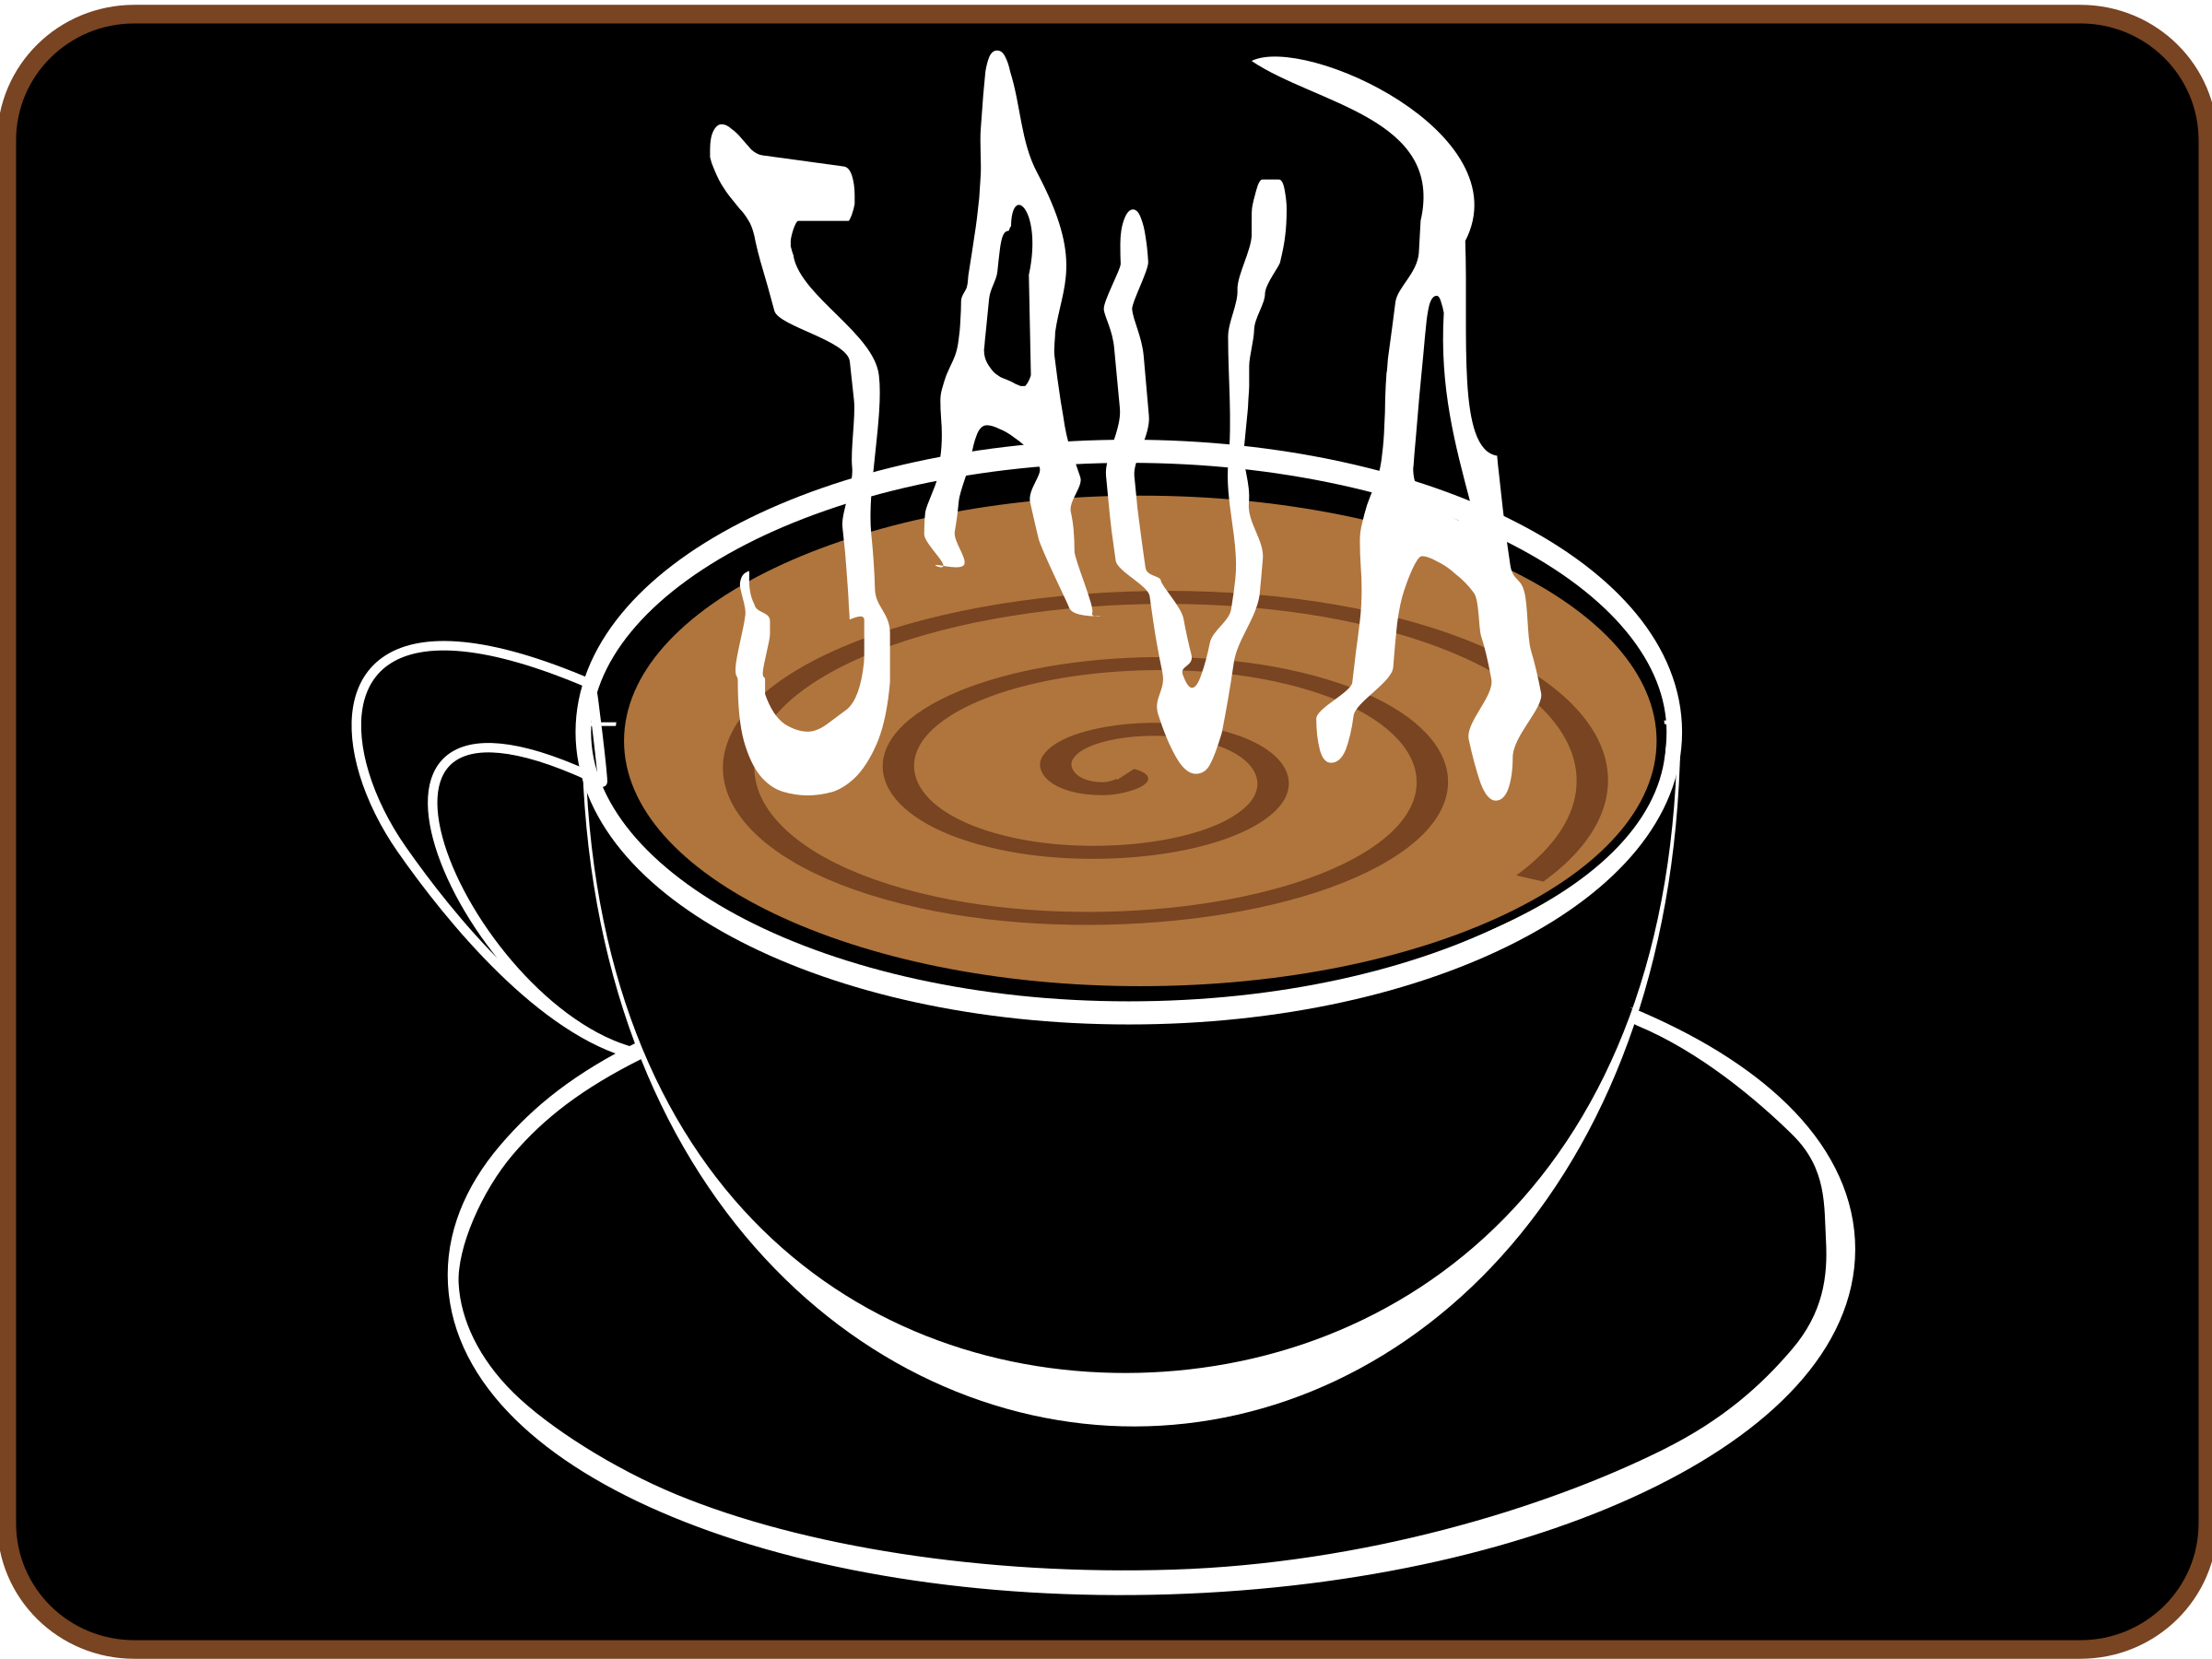 Java clipart #5, Download drawings